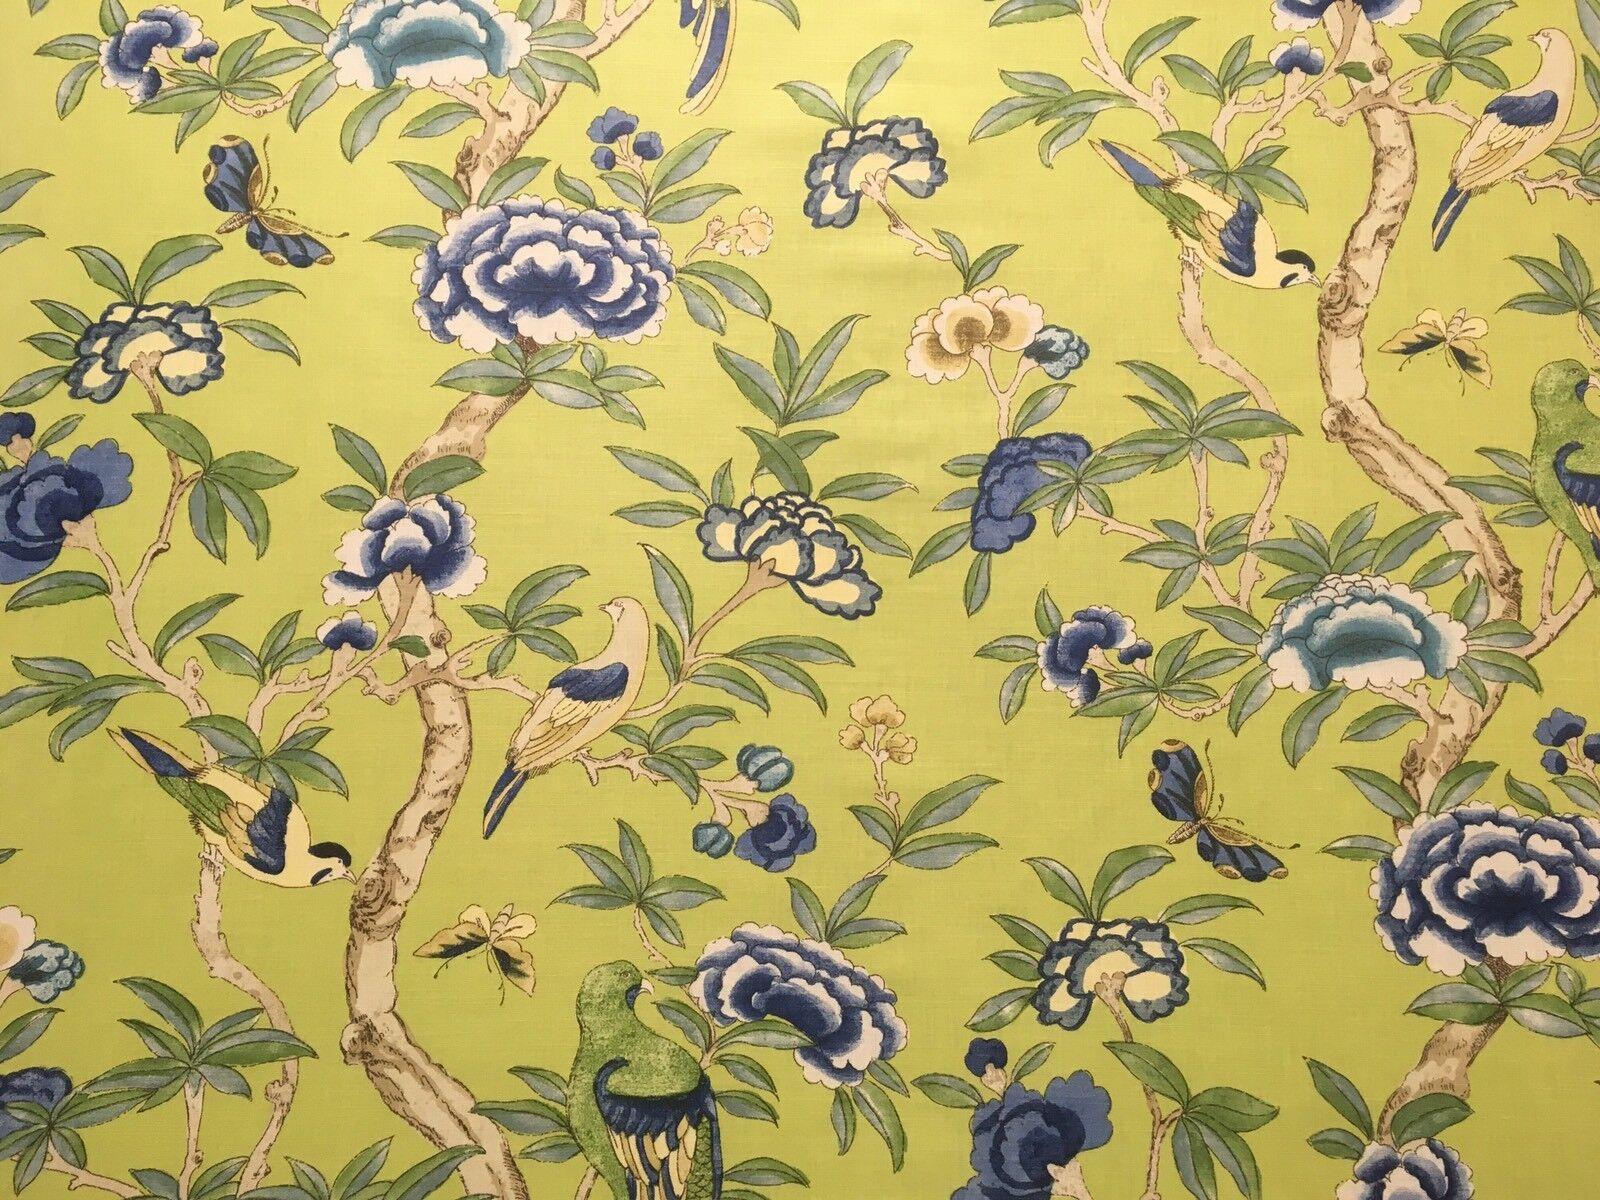 Thibaut Giselle tessuto per tende cuscino Cieco verde lino cotone Birds 2.2 M